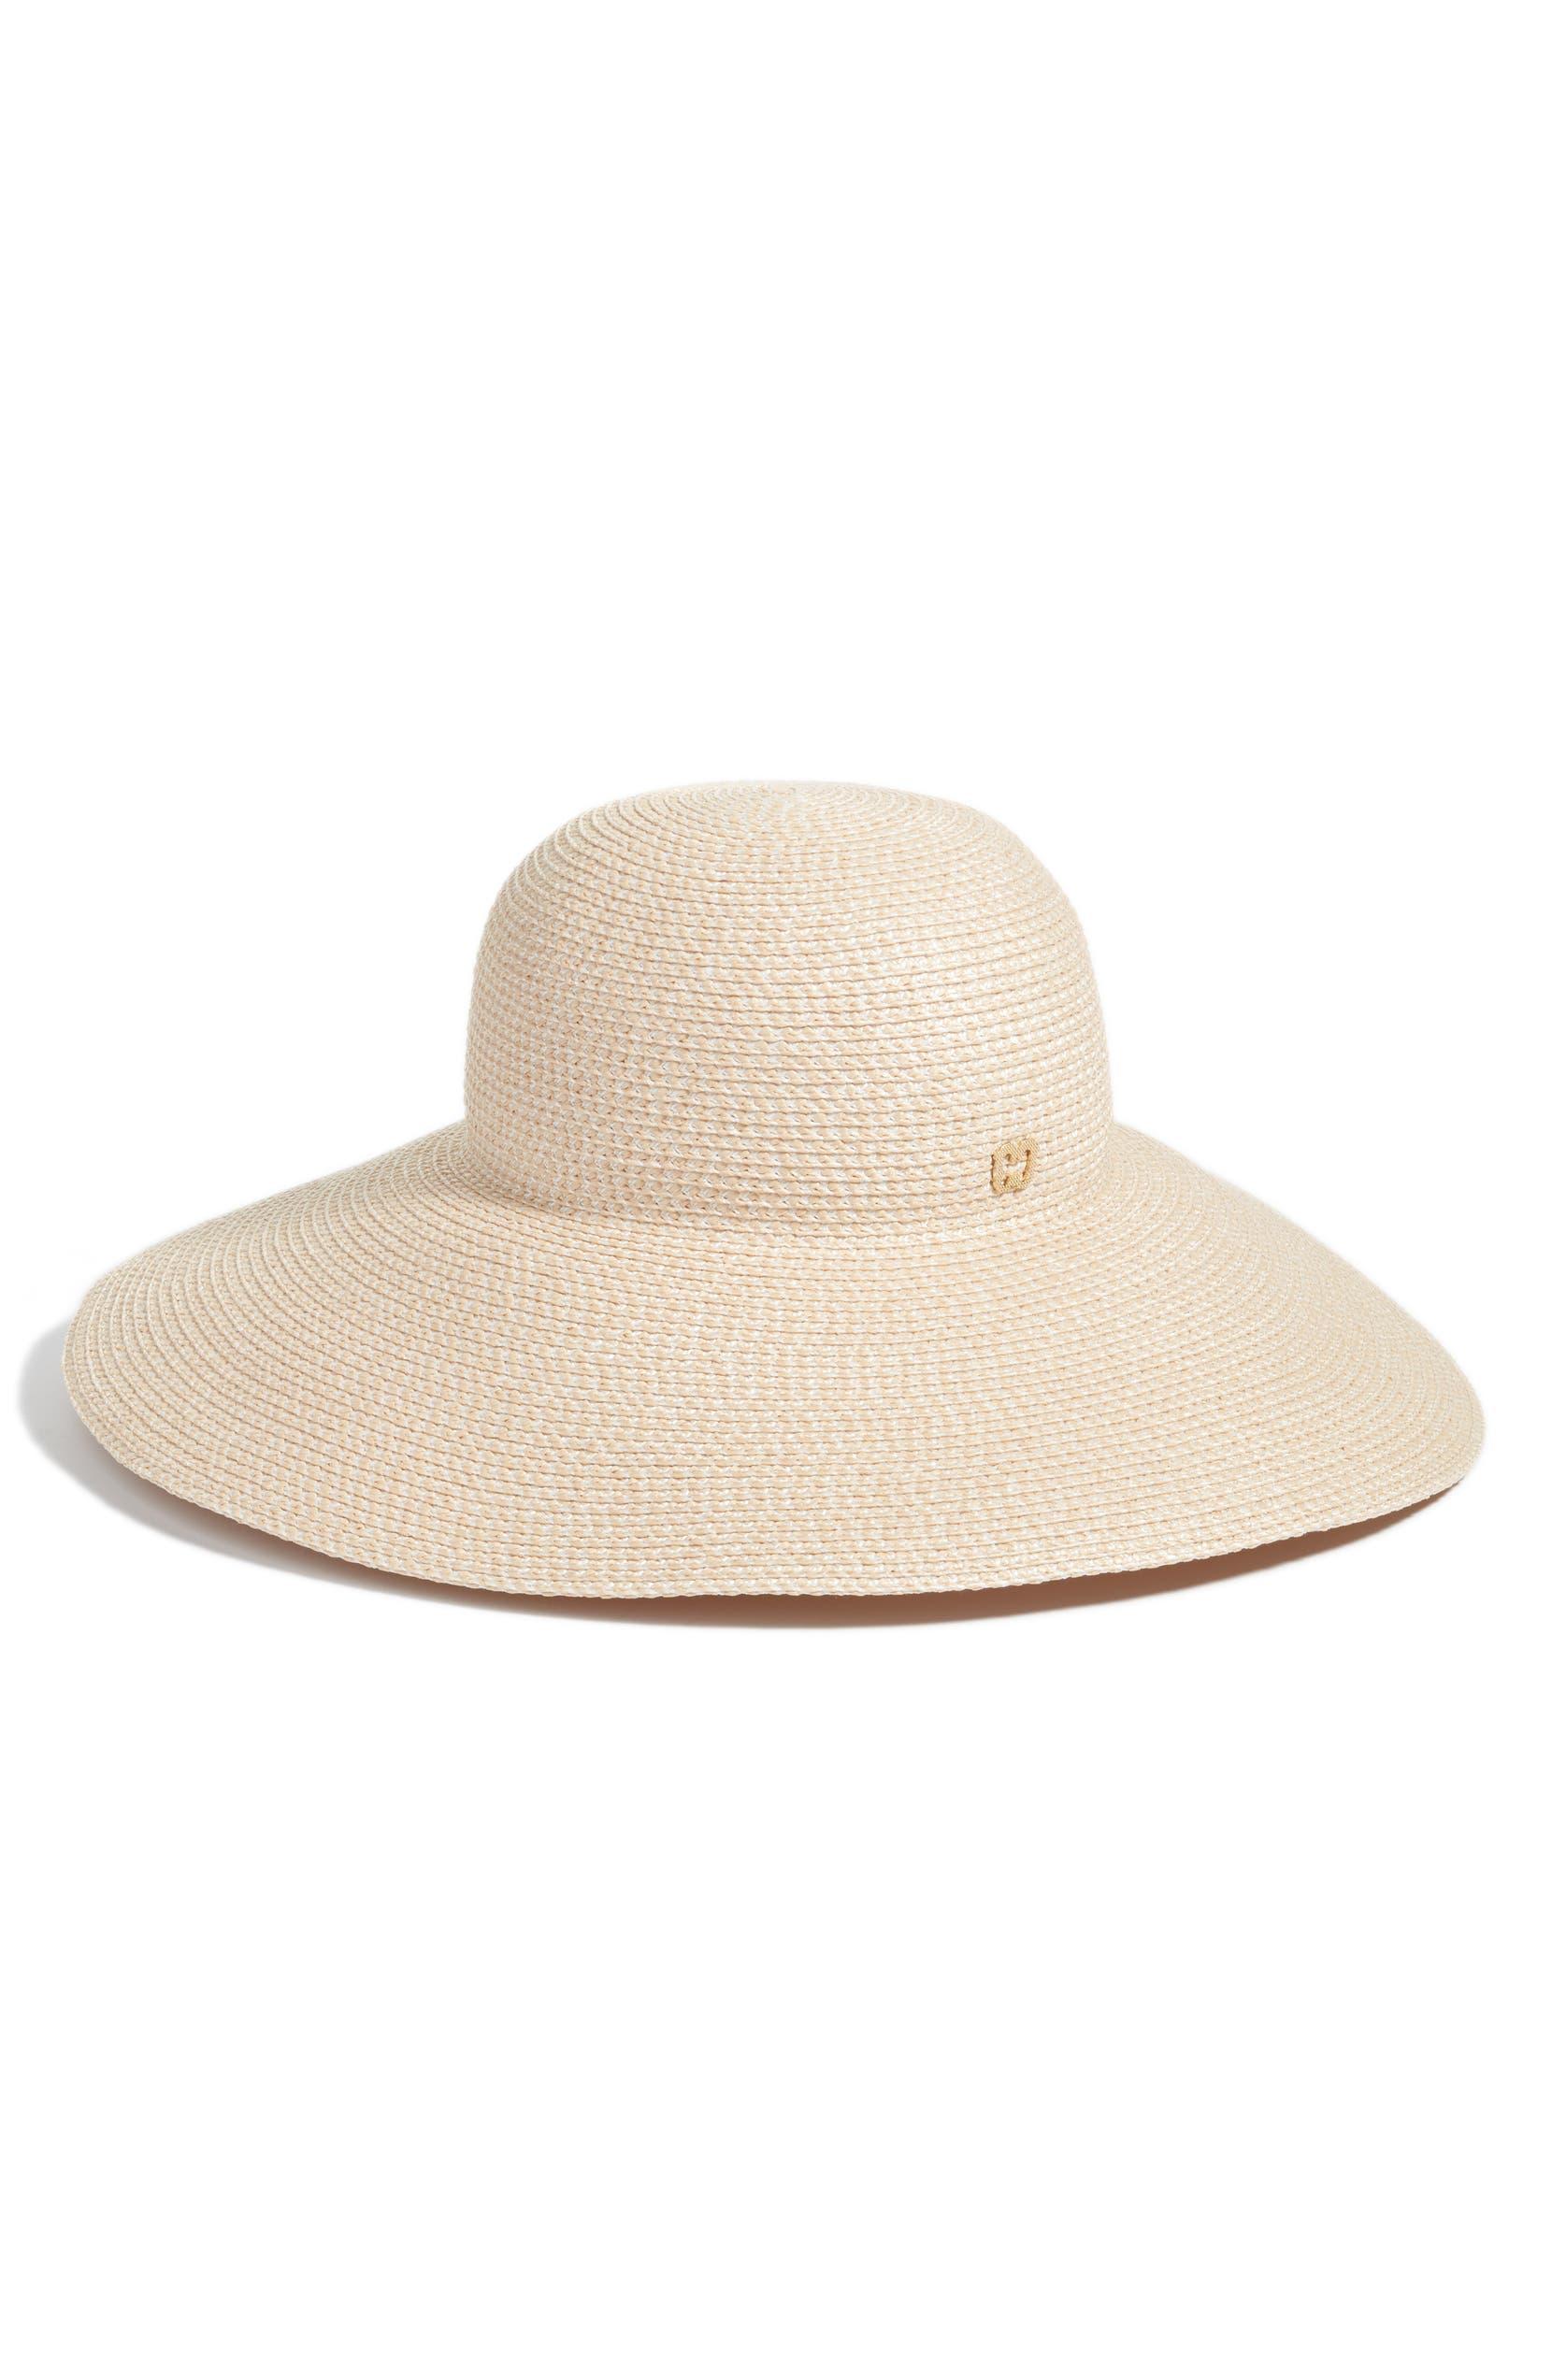 Eric Javits Bella Squishee® Sun Hat  b0d017685602